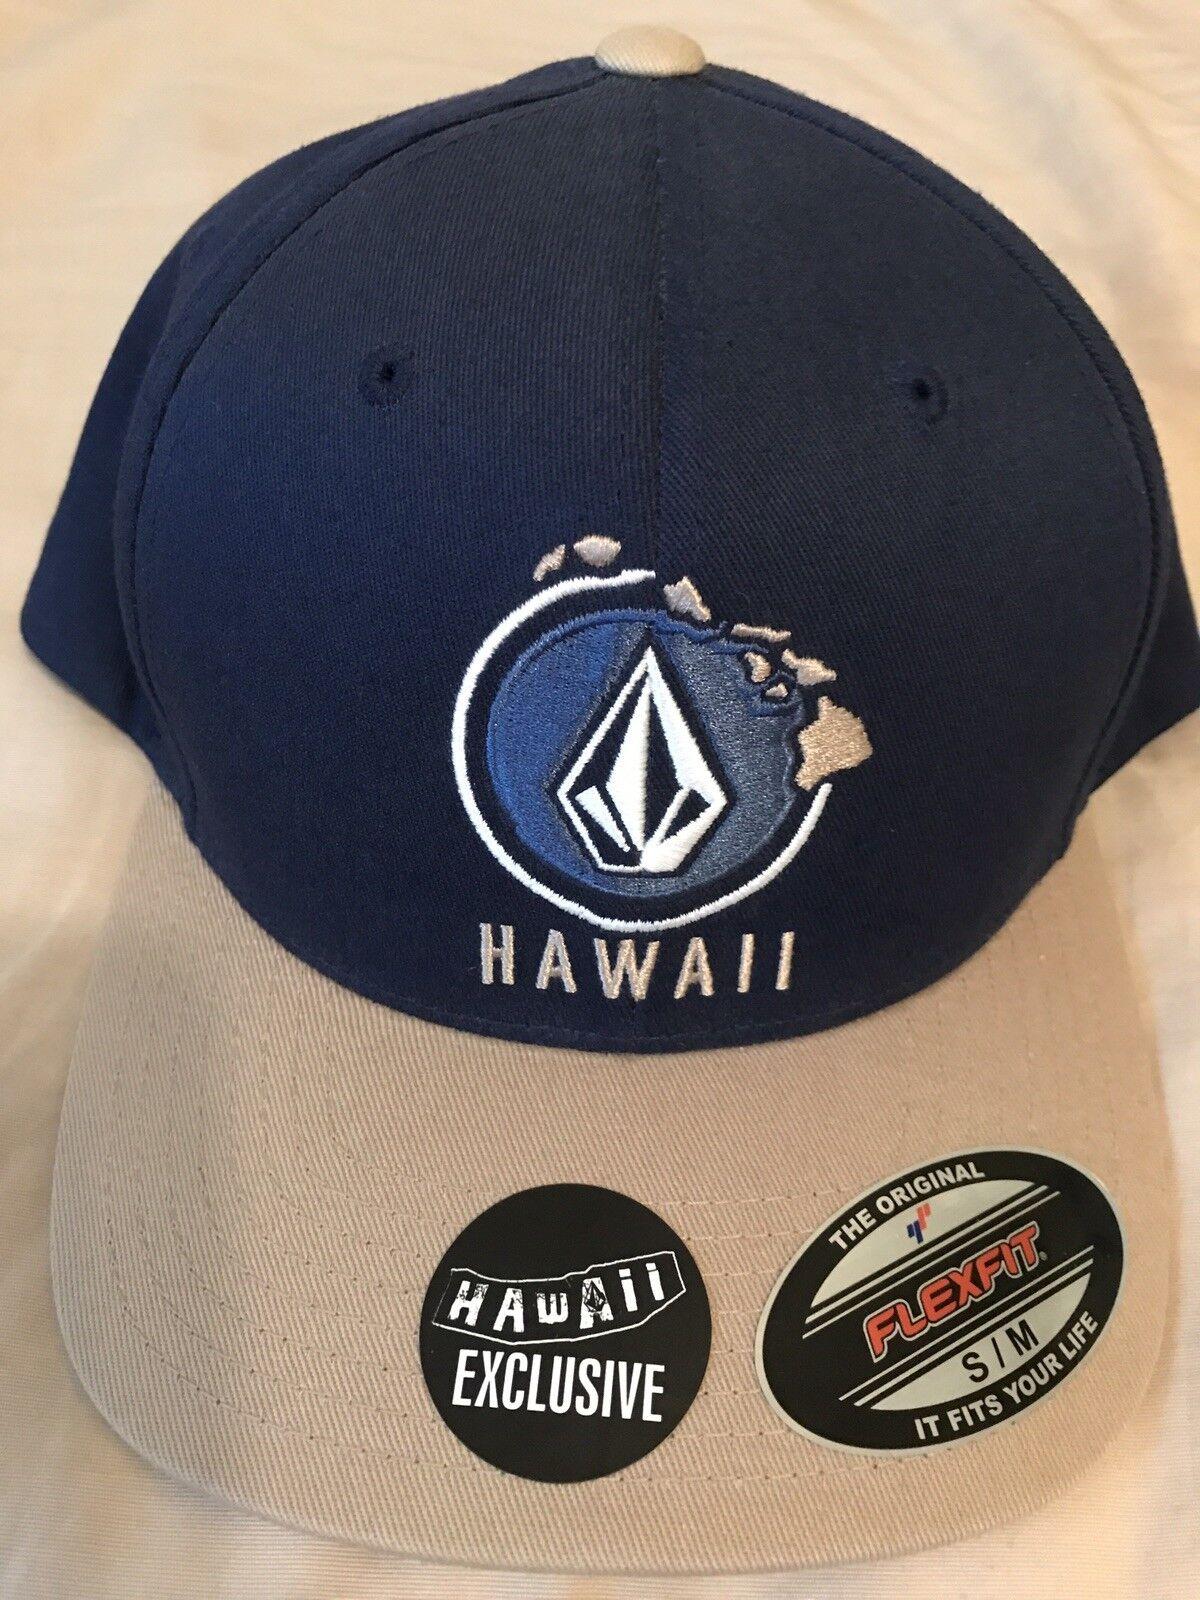 Men's NWT VOLCOM HAWAII Exclusive Blue and Tan FLEXFIT HAT F